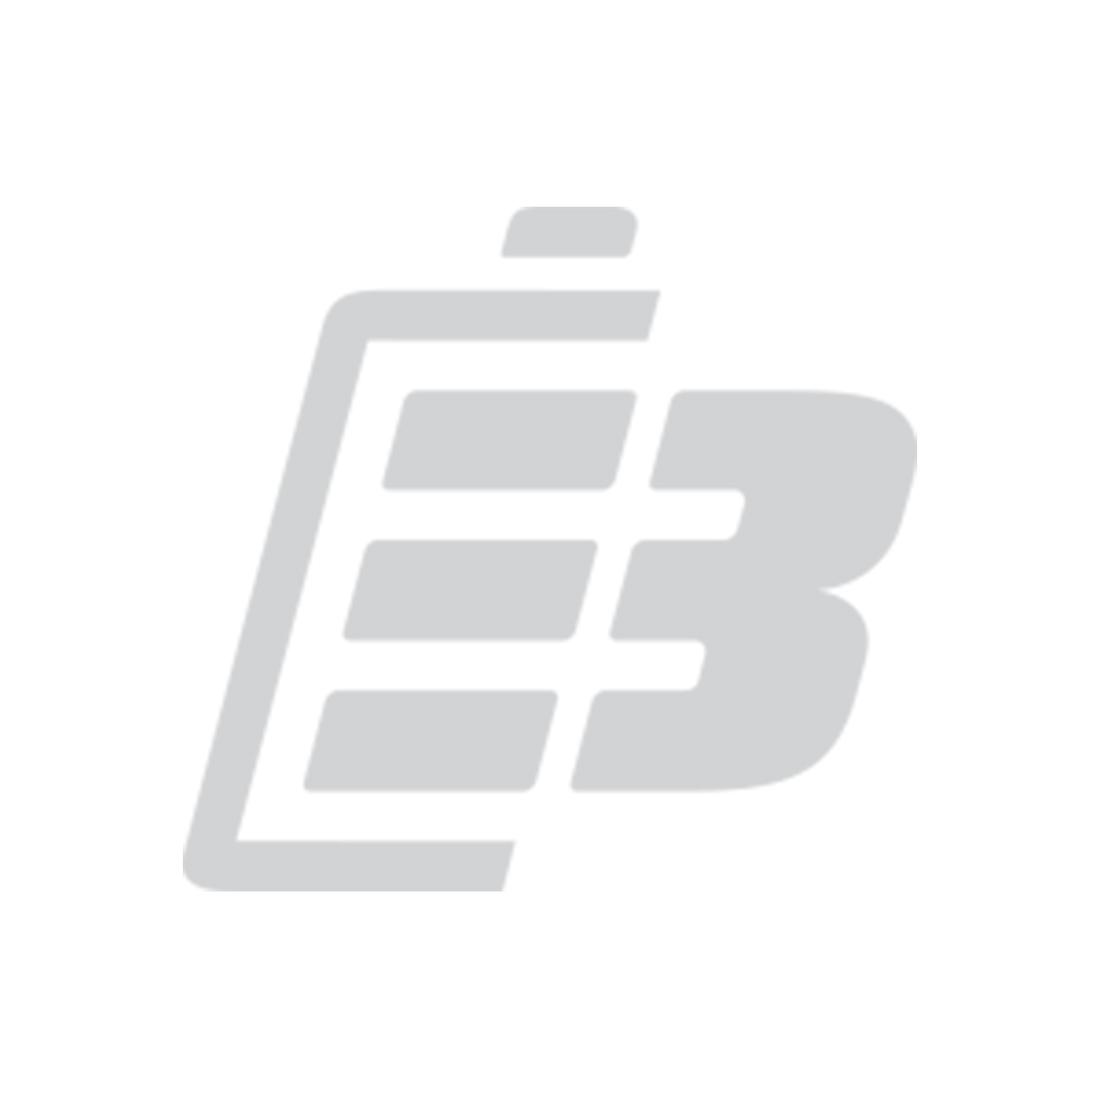 Power tool battery Makita 18V 3.0Ah_1